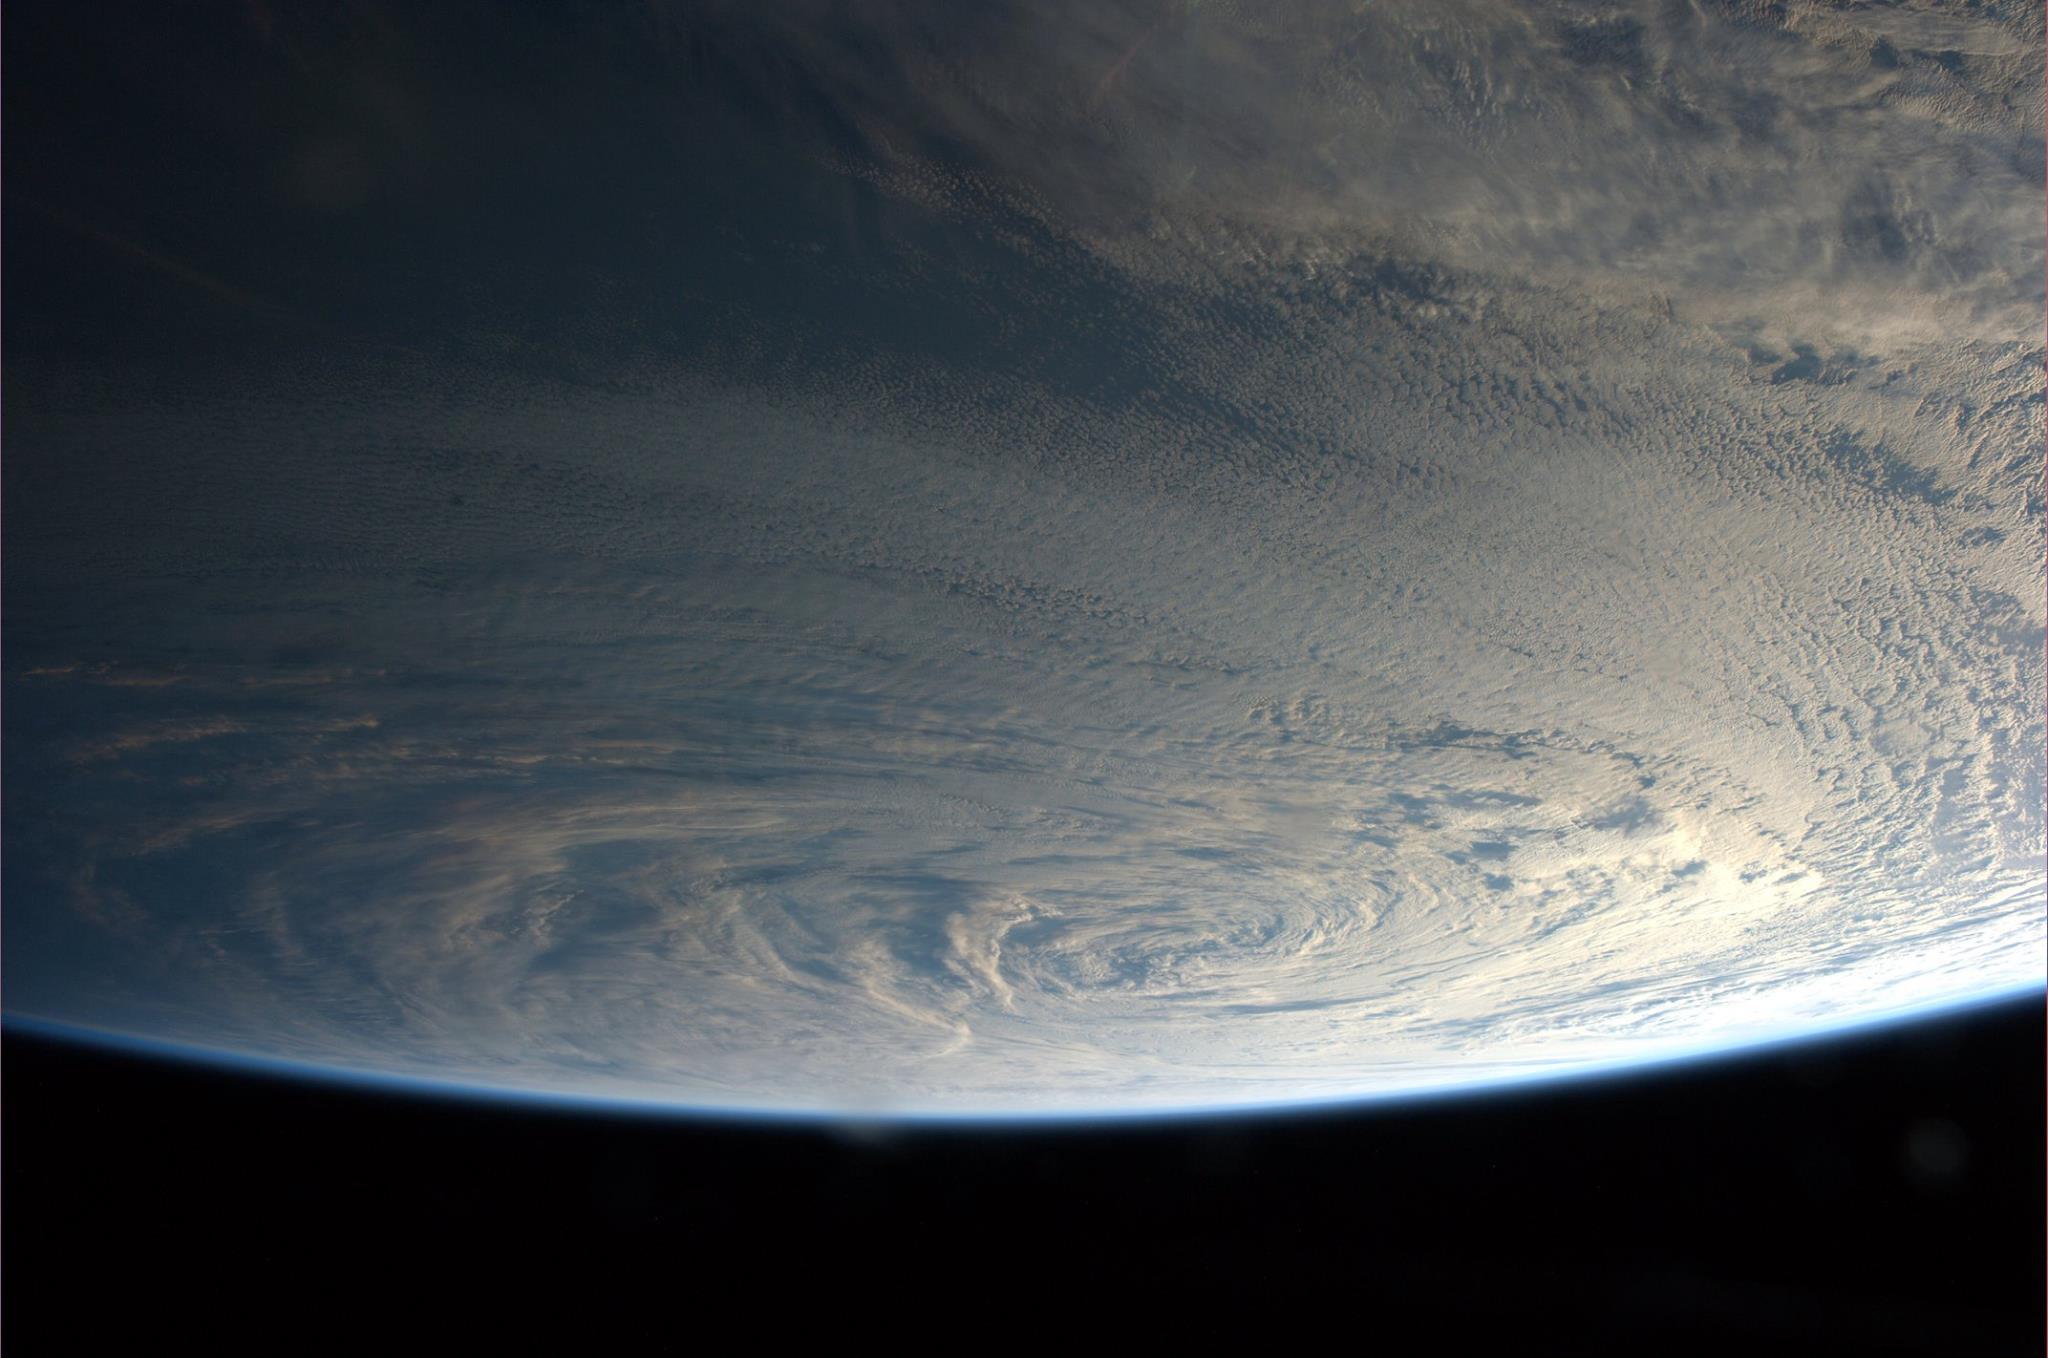 Photos astronaut Alexander Gerst 01